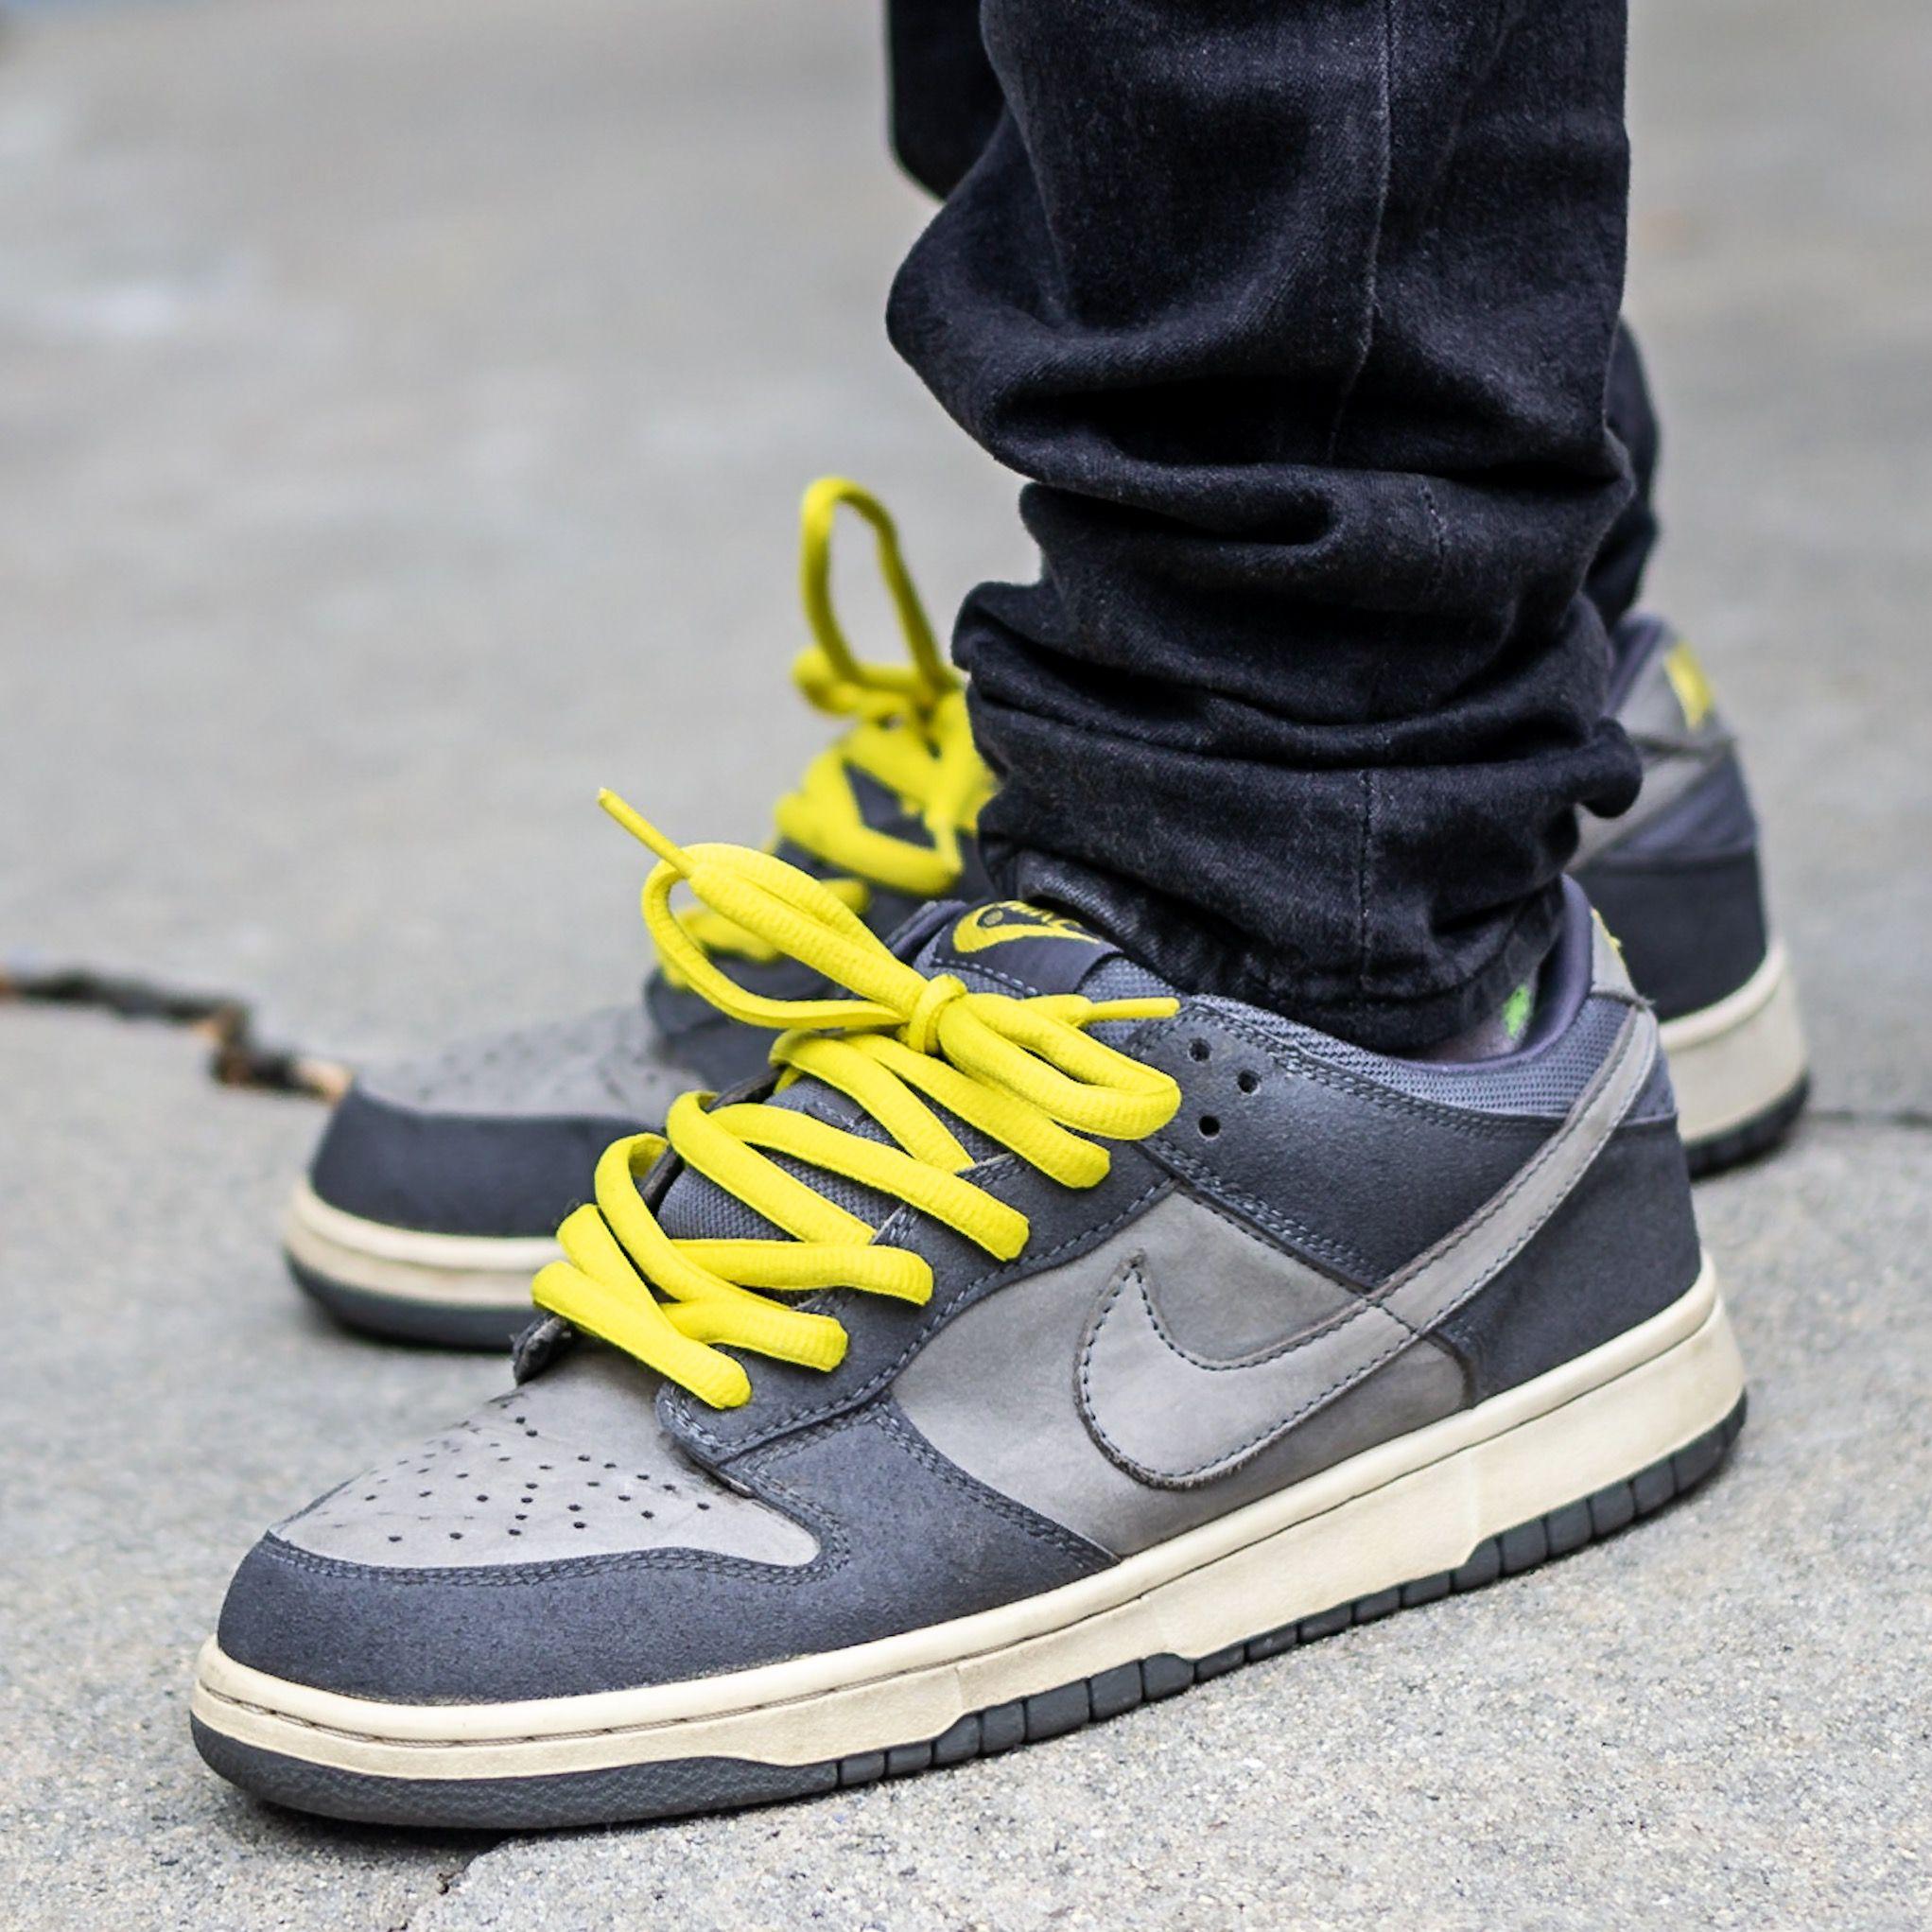 Nike Dunk Low Pro B Lightning On Feet Sneaker Review | Nike